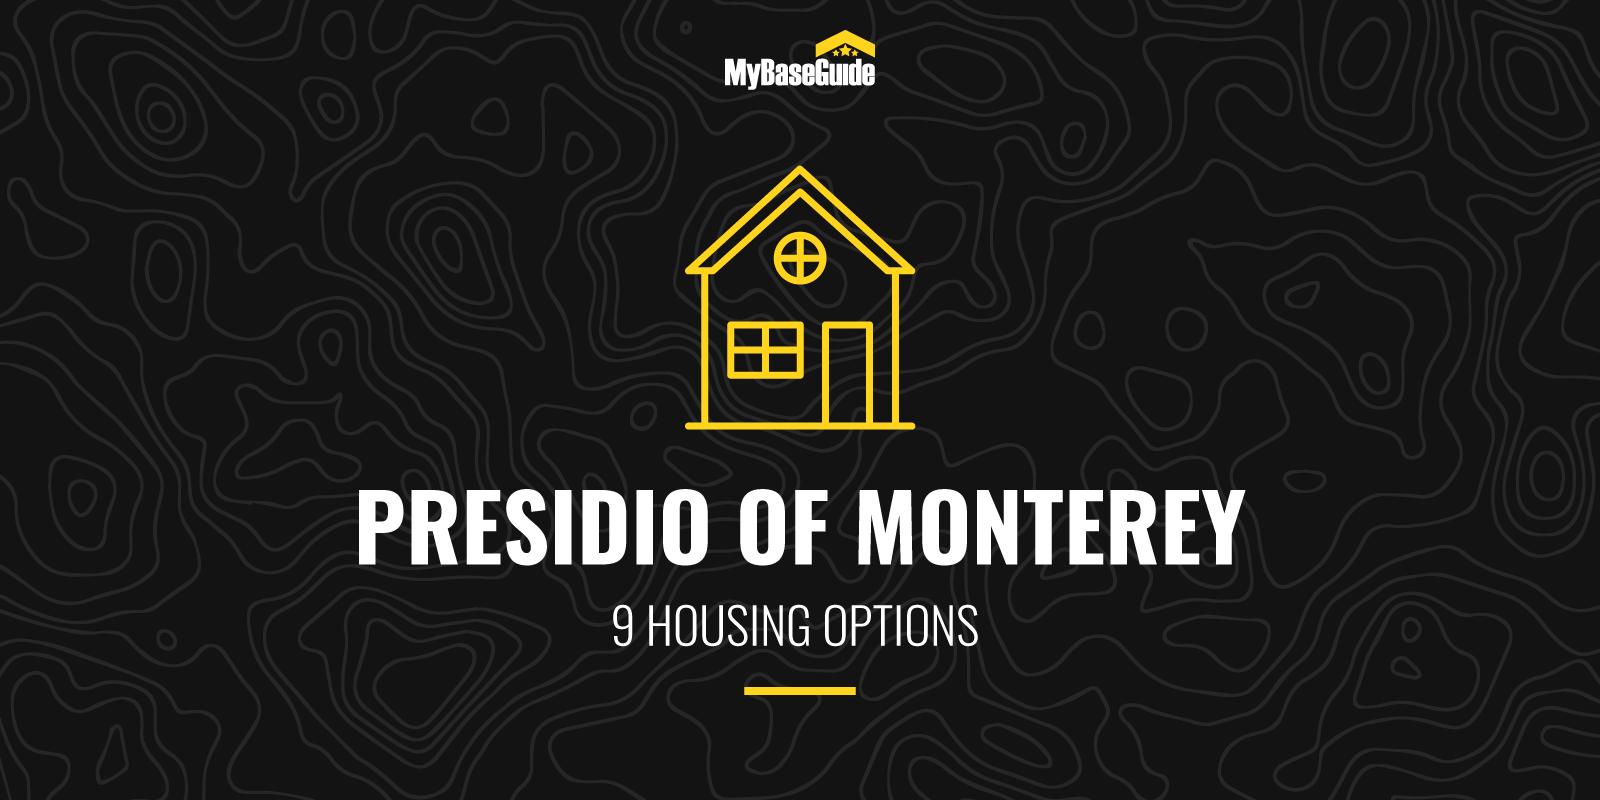 9 Presidio of Monterey Housing Options